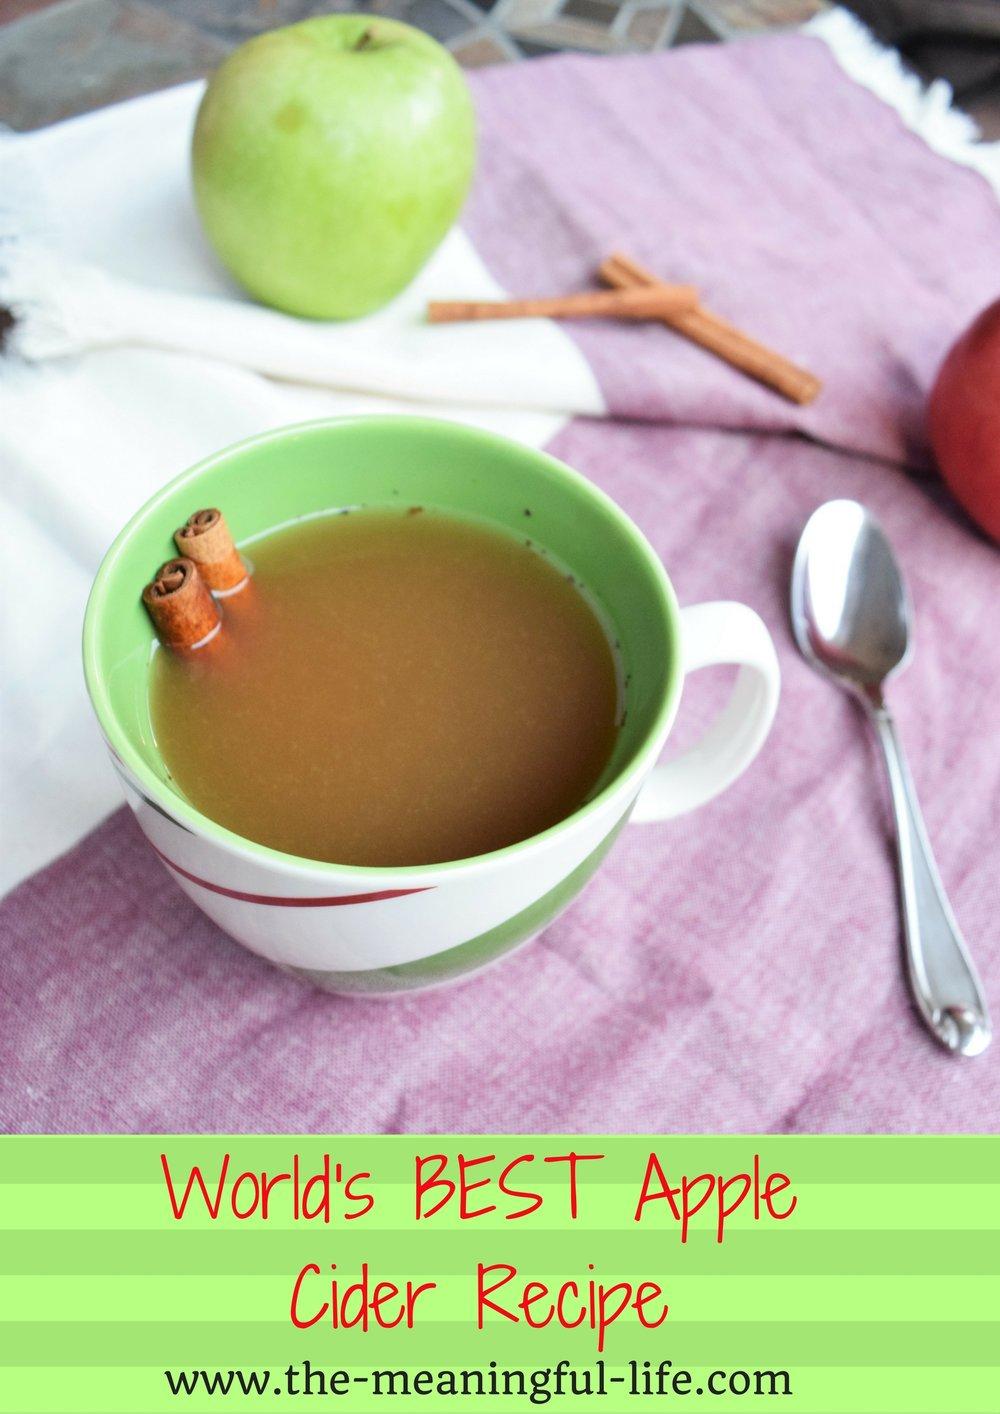 World's BEST Apple Cider Recipe